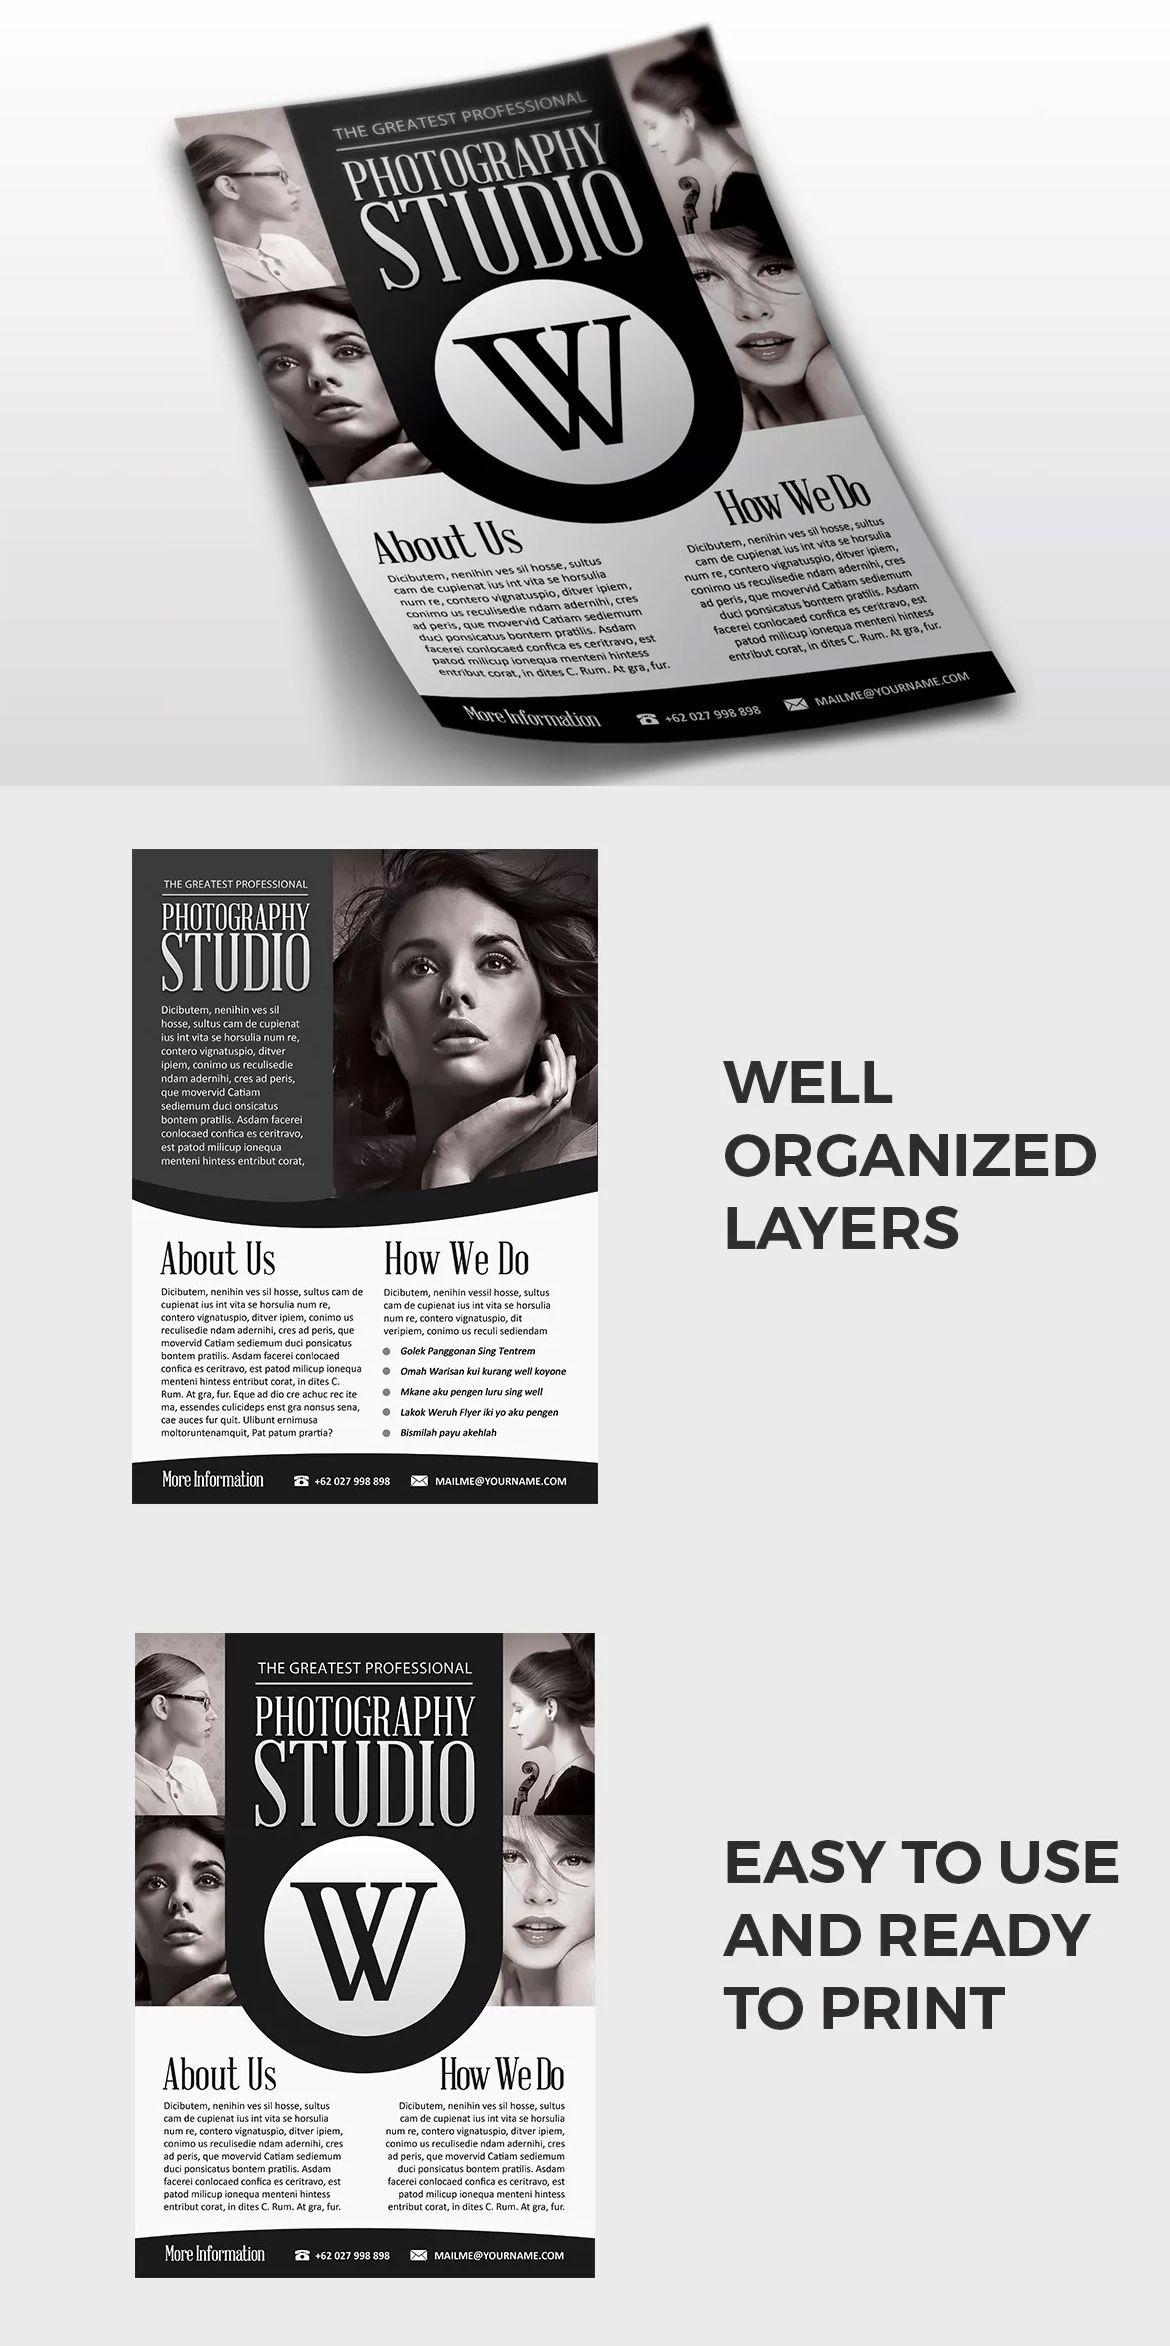 Photography Flyer Template PSD A4 | Flyer Design Templates ...